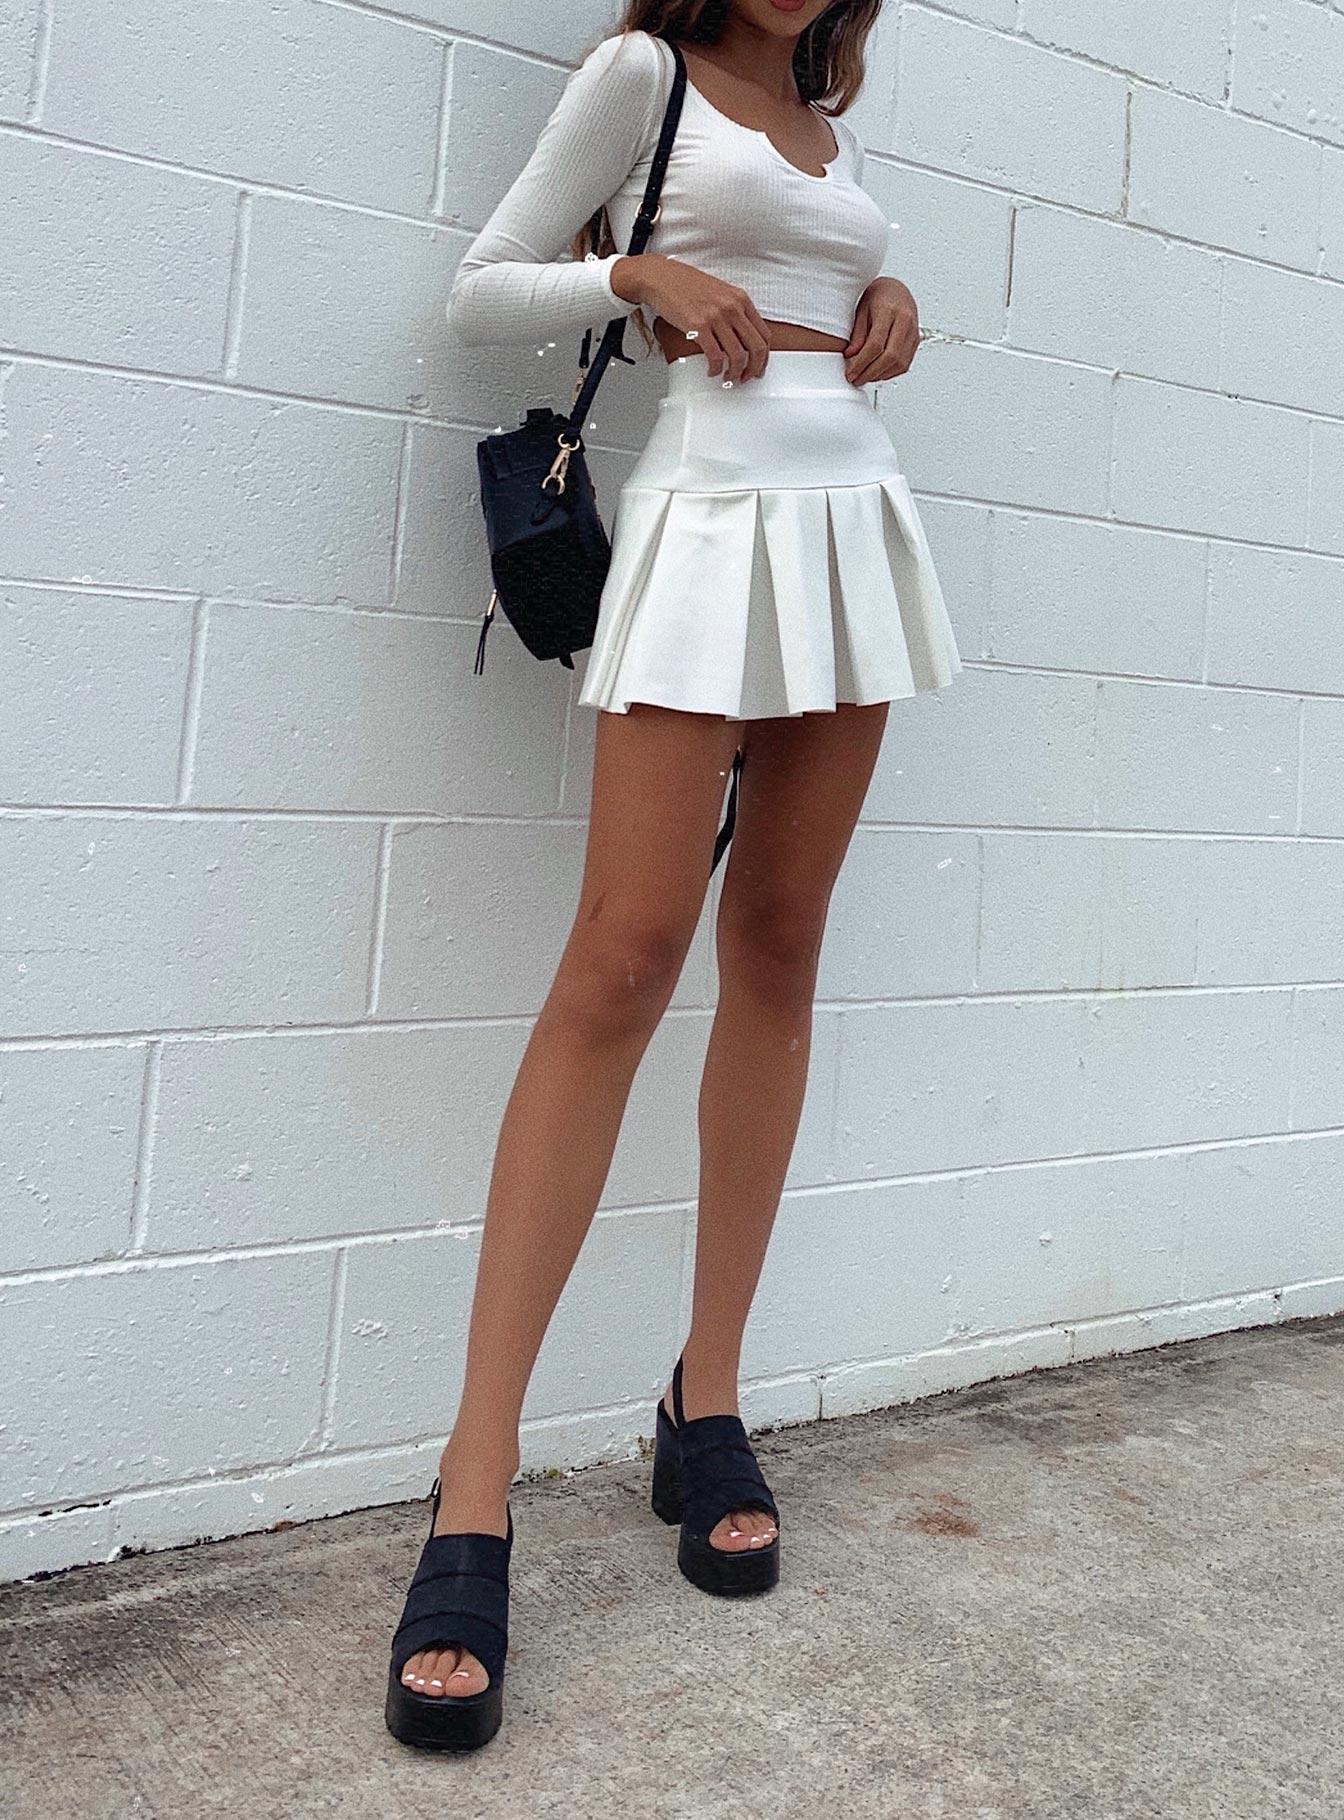 Pleated Mini Skirts (Side A)